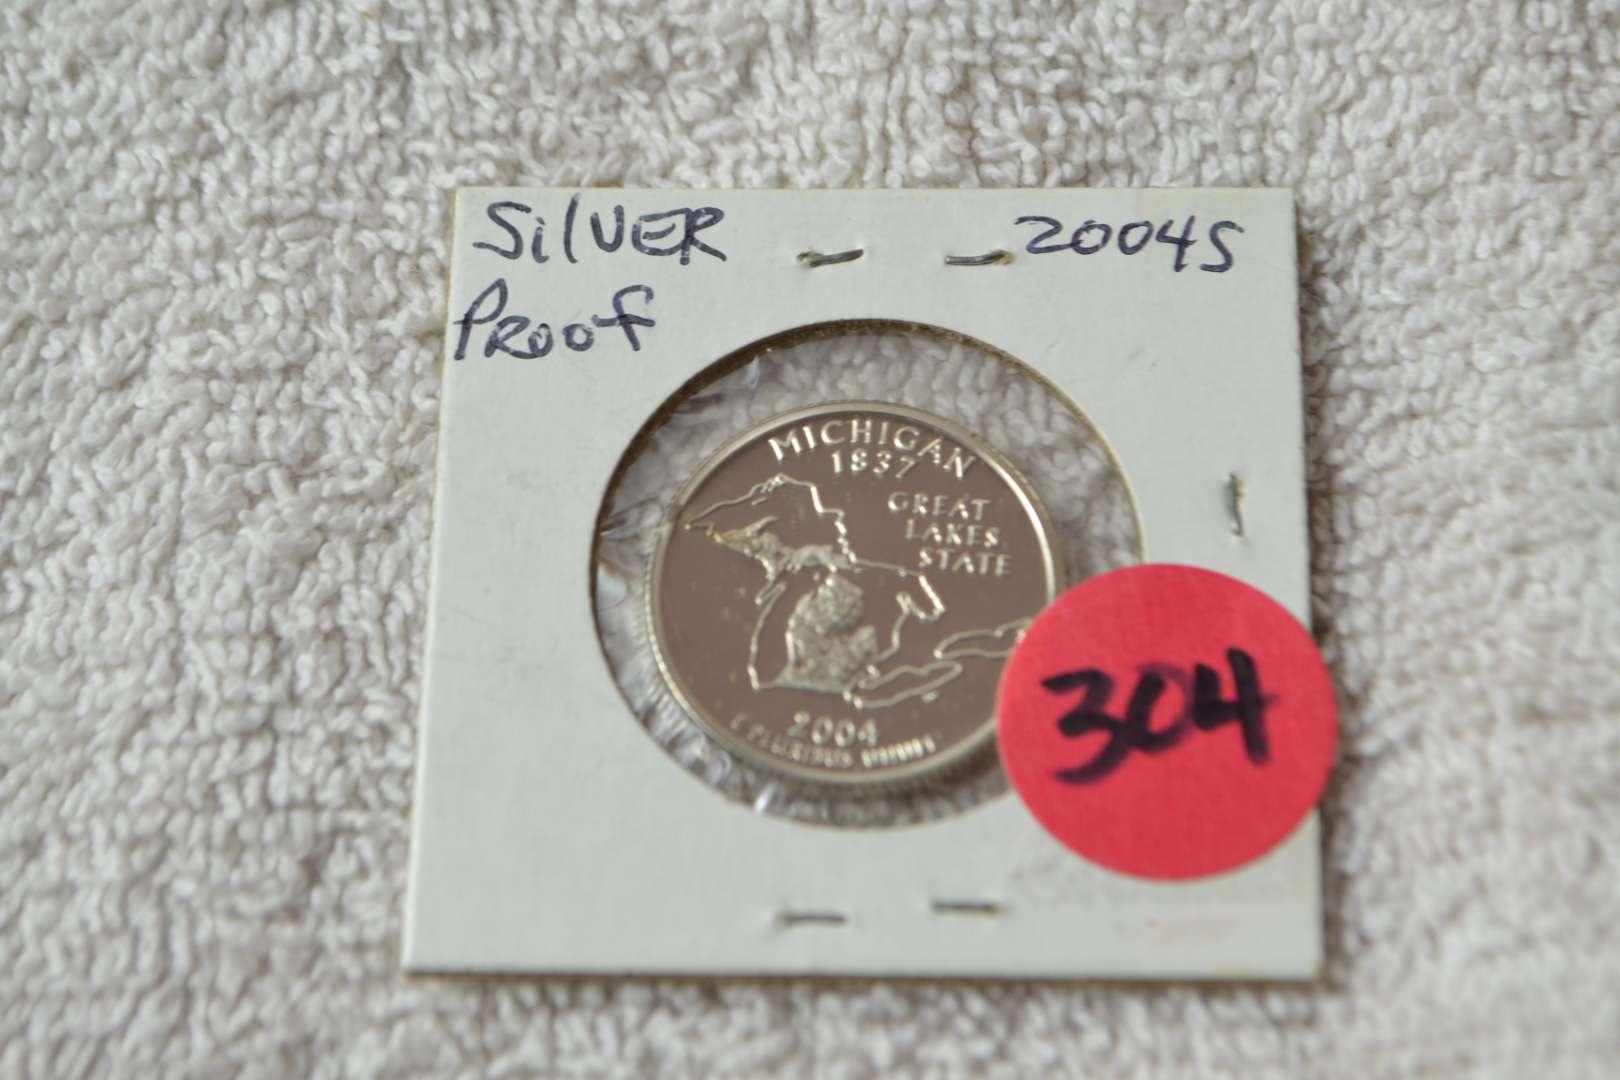 Lot # 304 2004-S SILVER PROOF QUARTER MICHIGAN